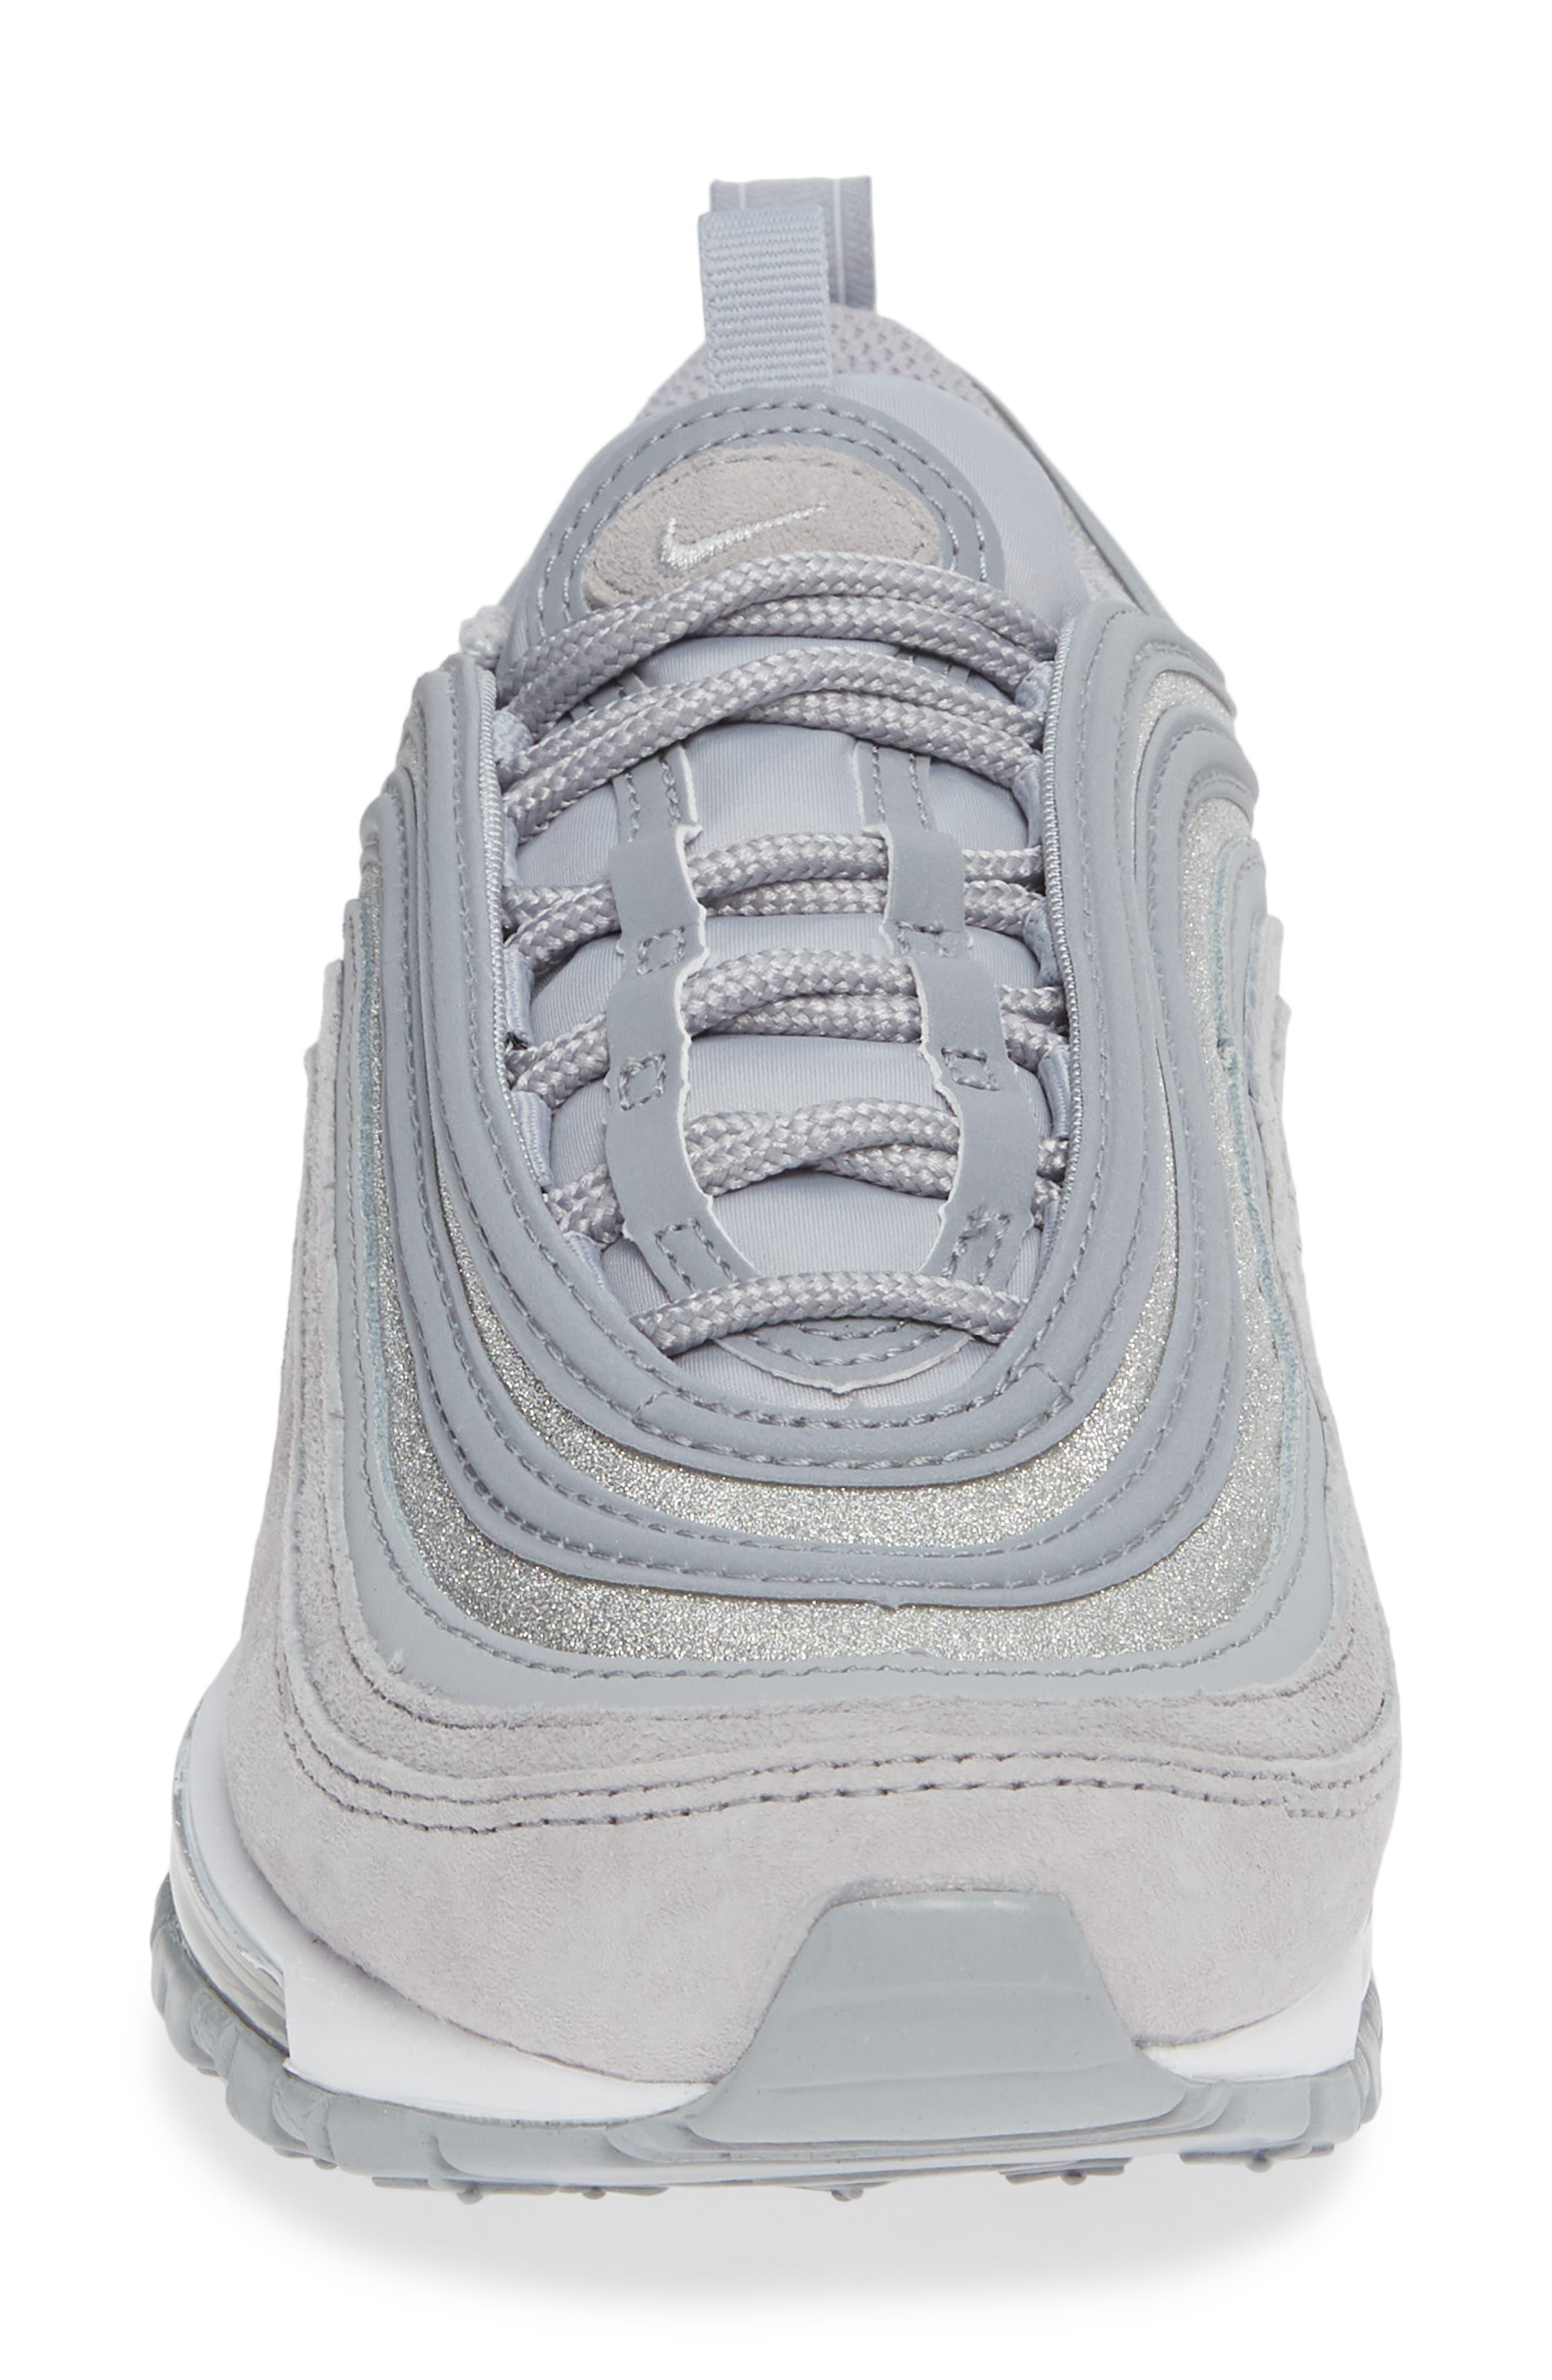 Air Max 97 Sneaker,                             Alternate thumbnail 4, color,                             WOLF GREY/ PLATINUM/ WHITE